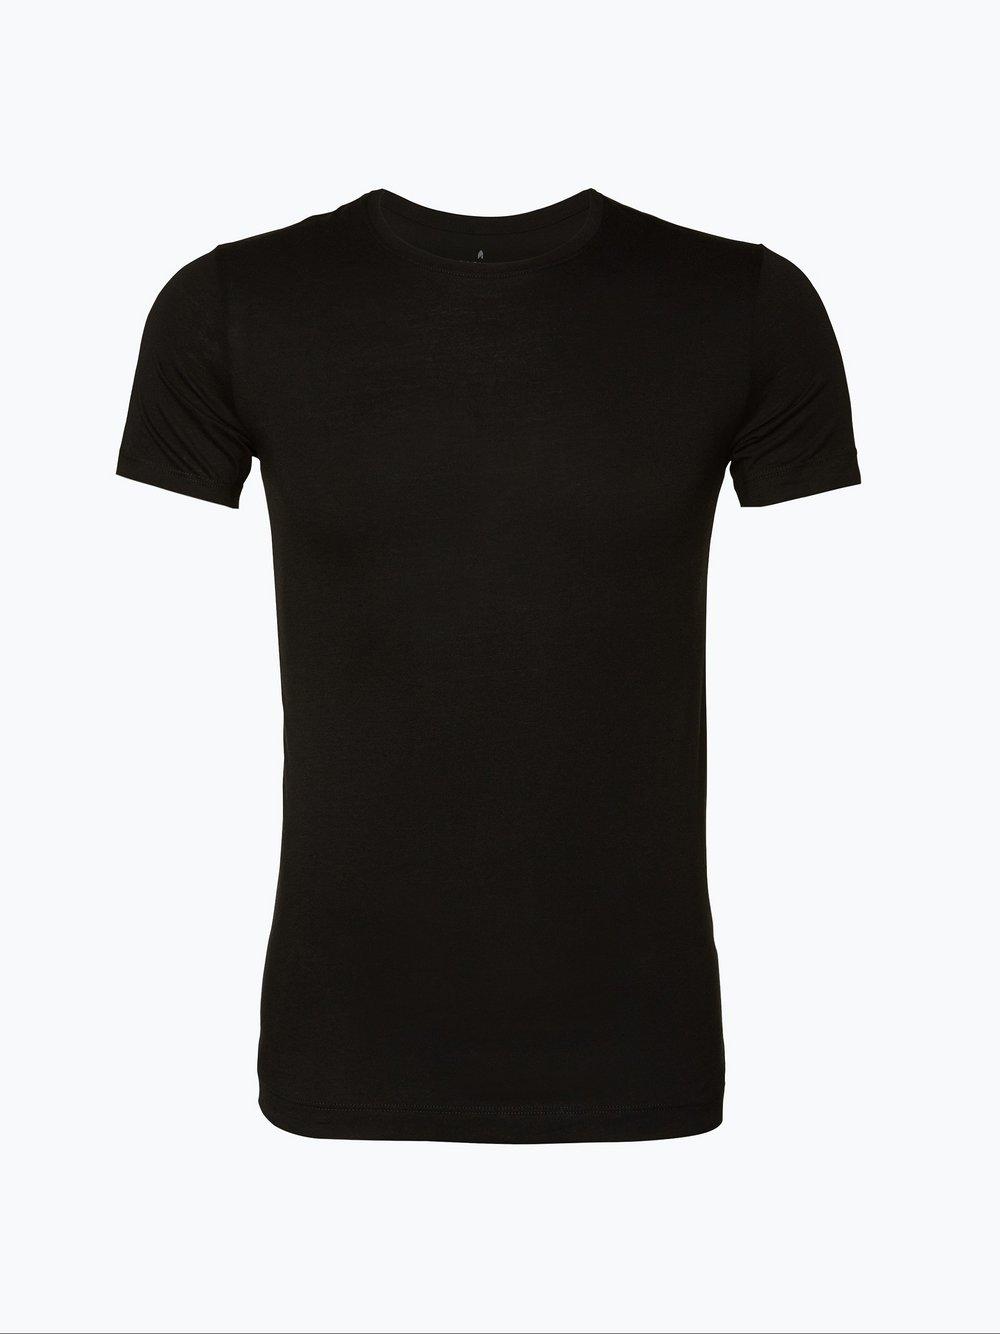 Ragman – T-shirty męskie pakowane po 2 sztuki, czarny Van Graaf 102378-0001-09990